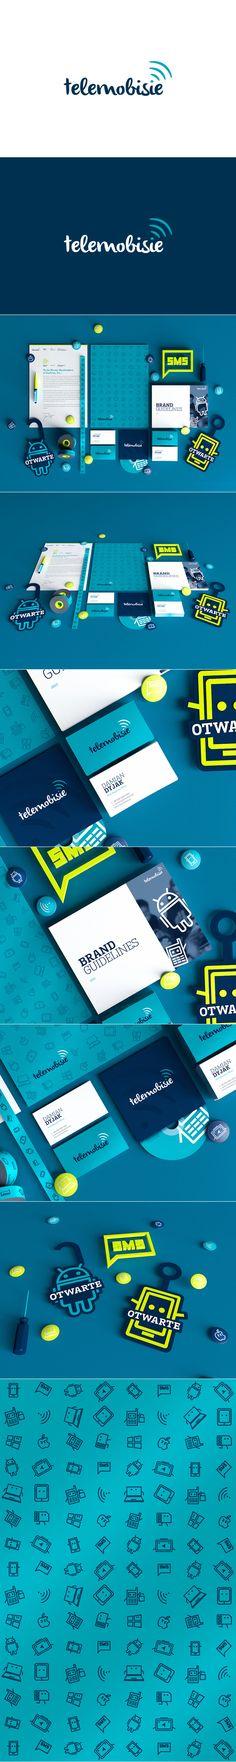 Telemobisie brand